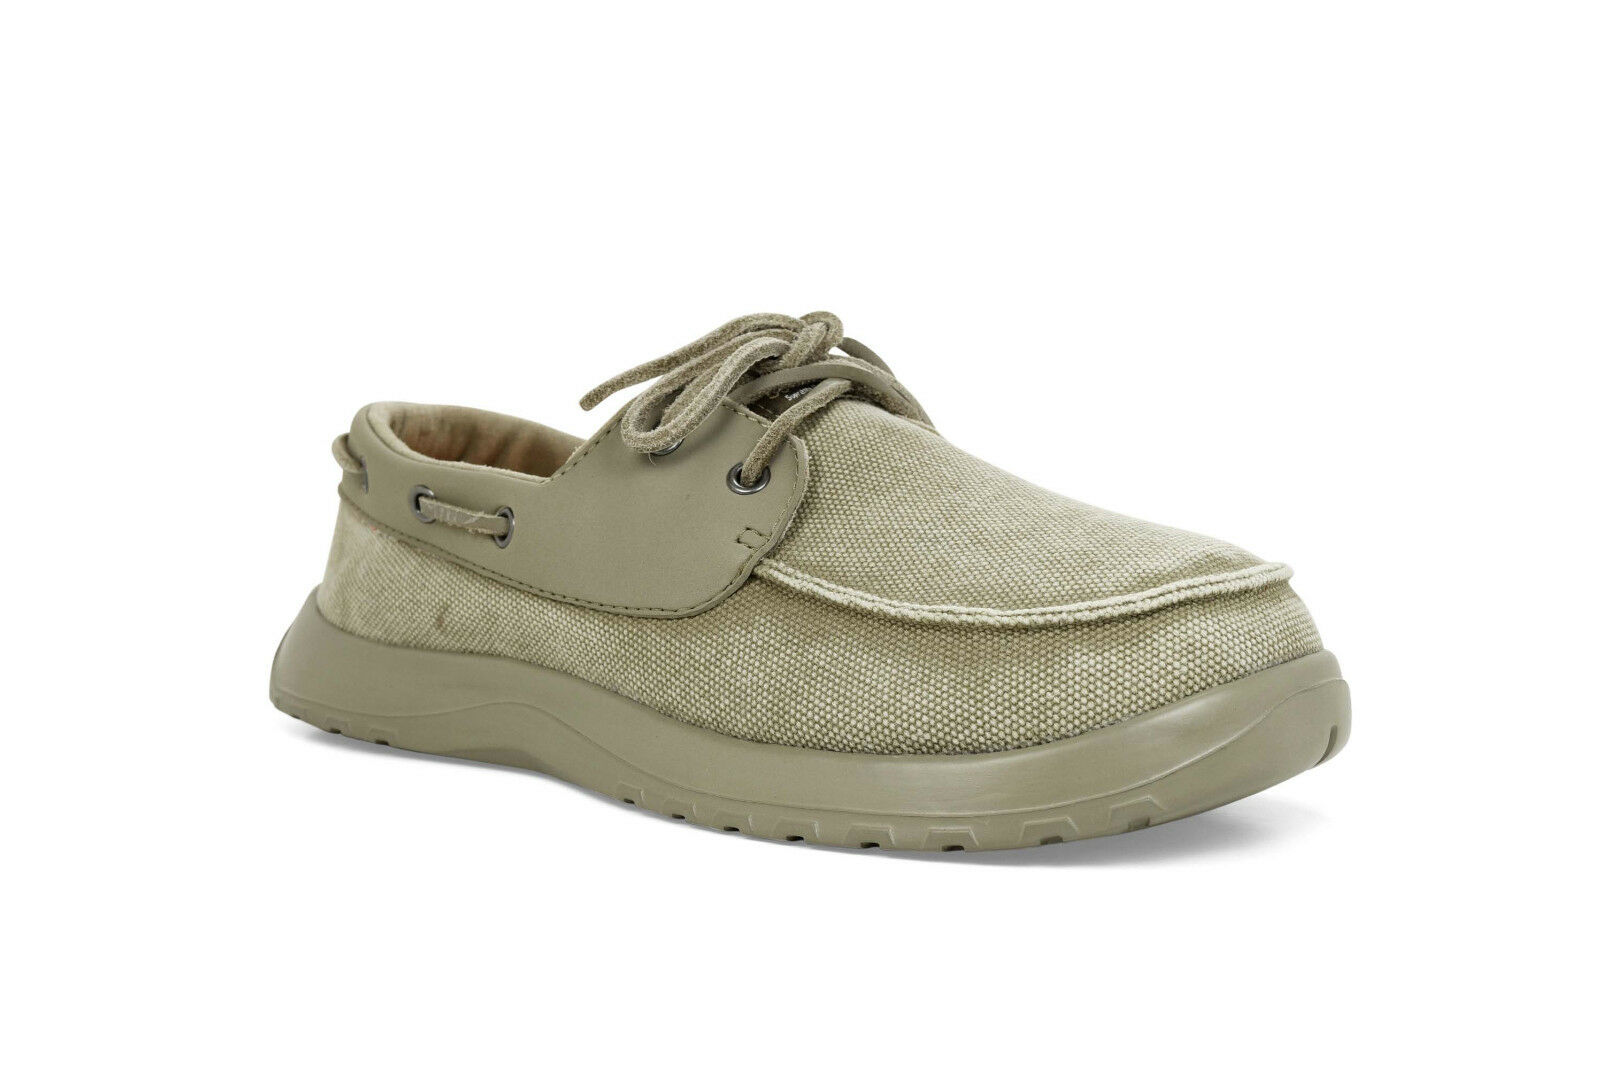 Descuento de la marca Softscience cruise canvas mocasín Boot zapatos vela zapatos caqui